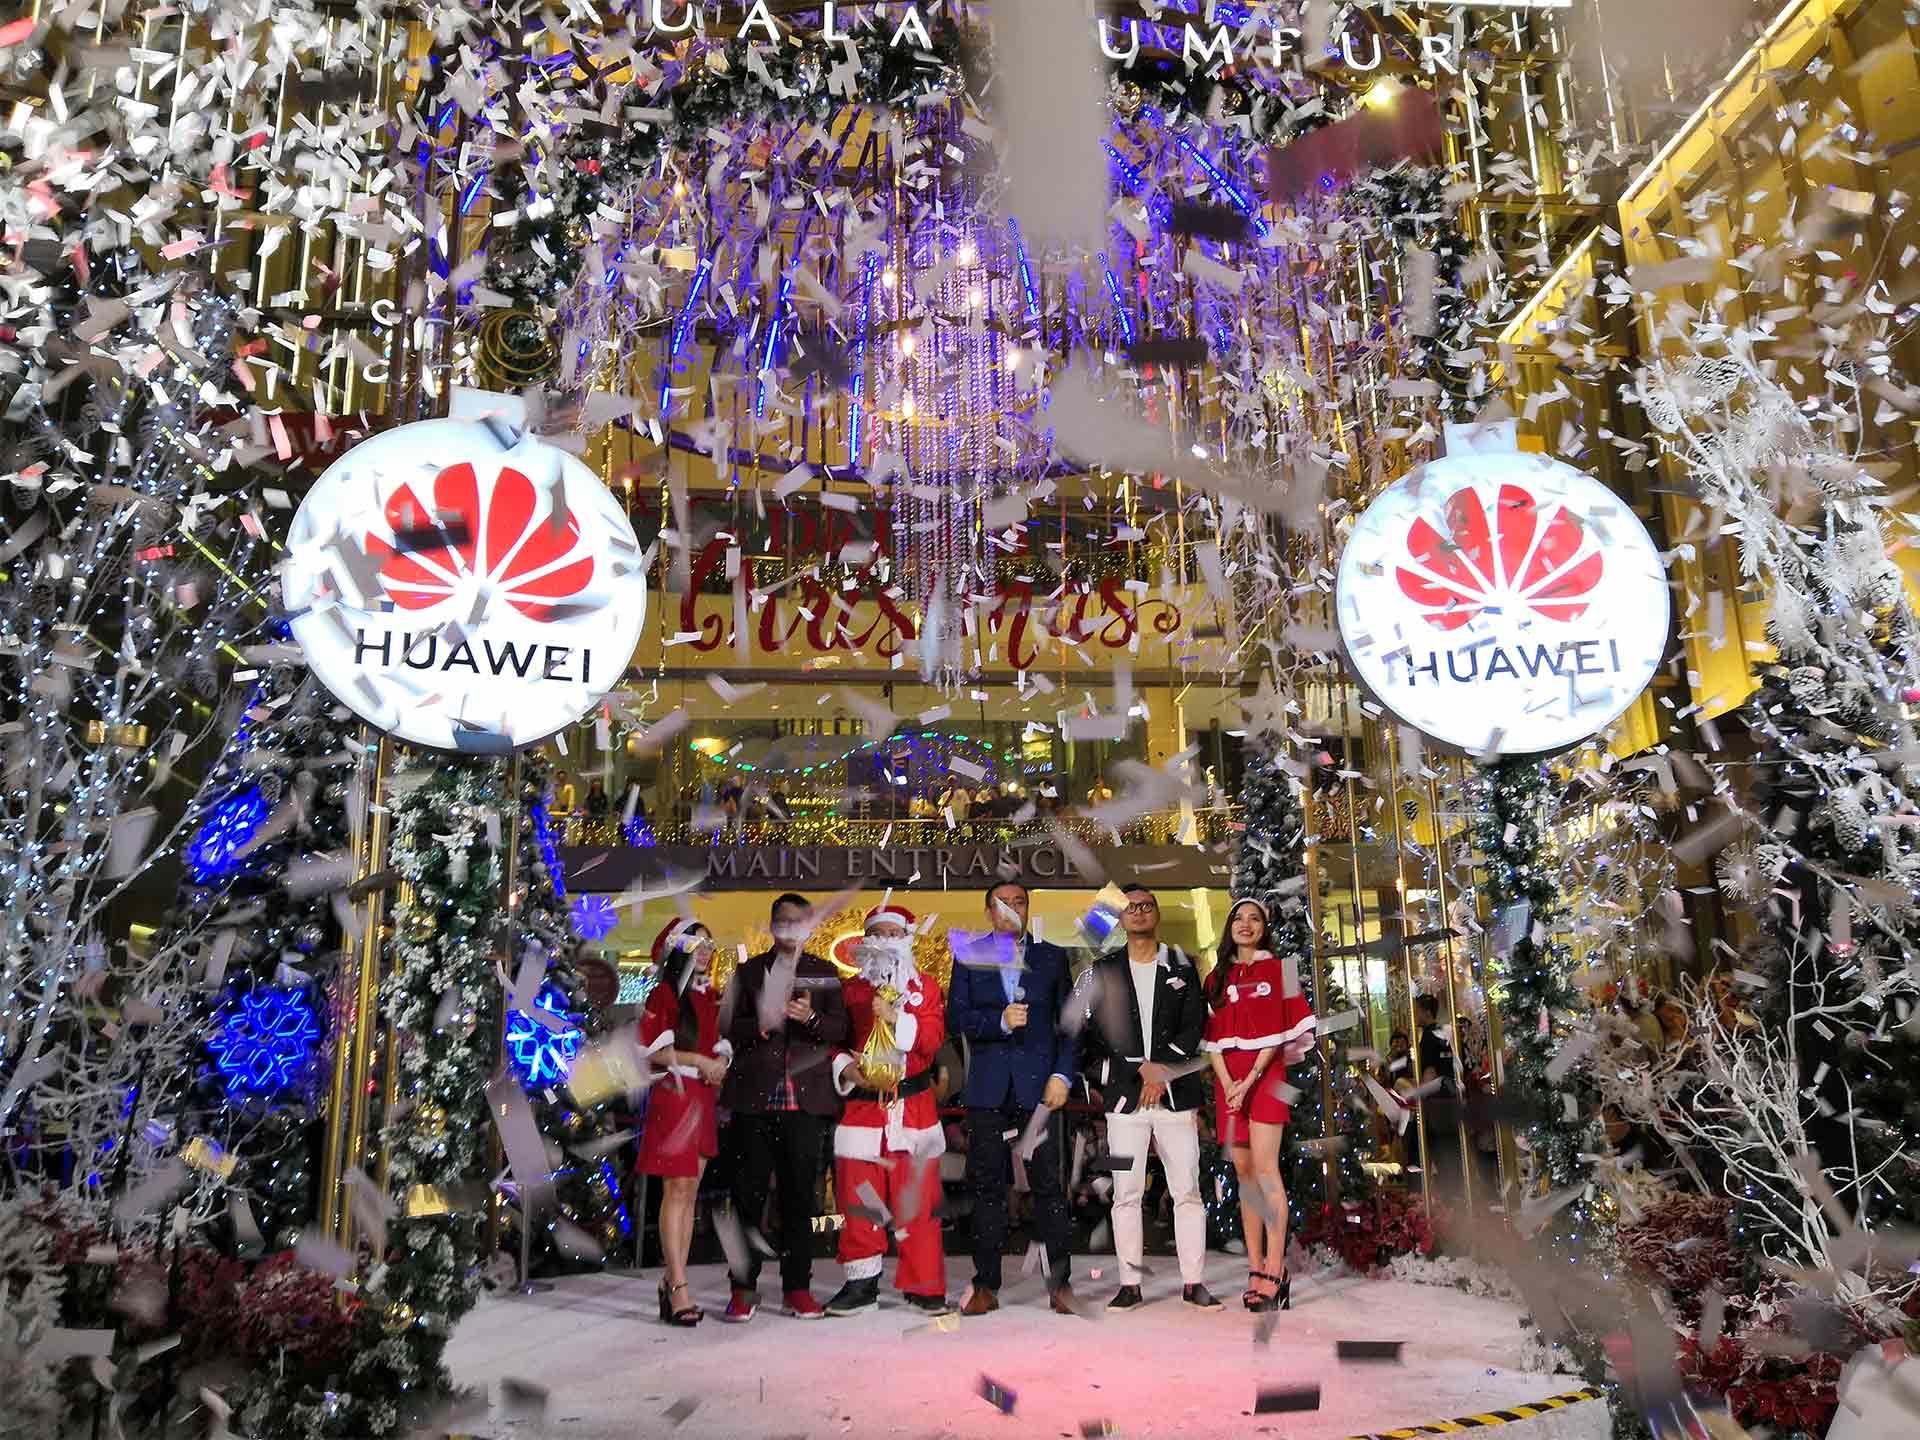 Snowy Christmas.Huawei Snowy Christmas At Pavilion Kl